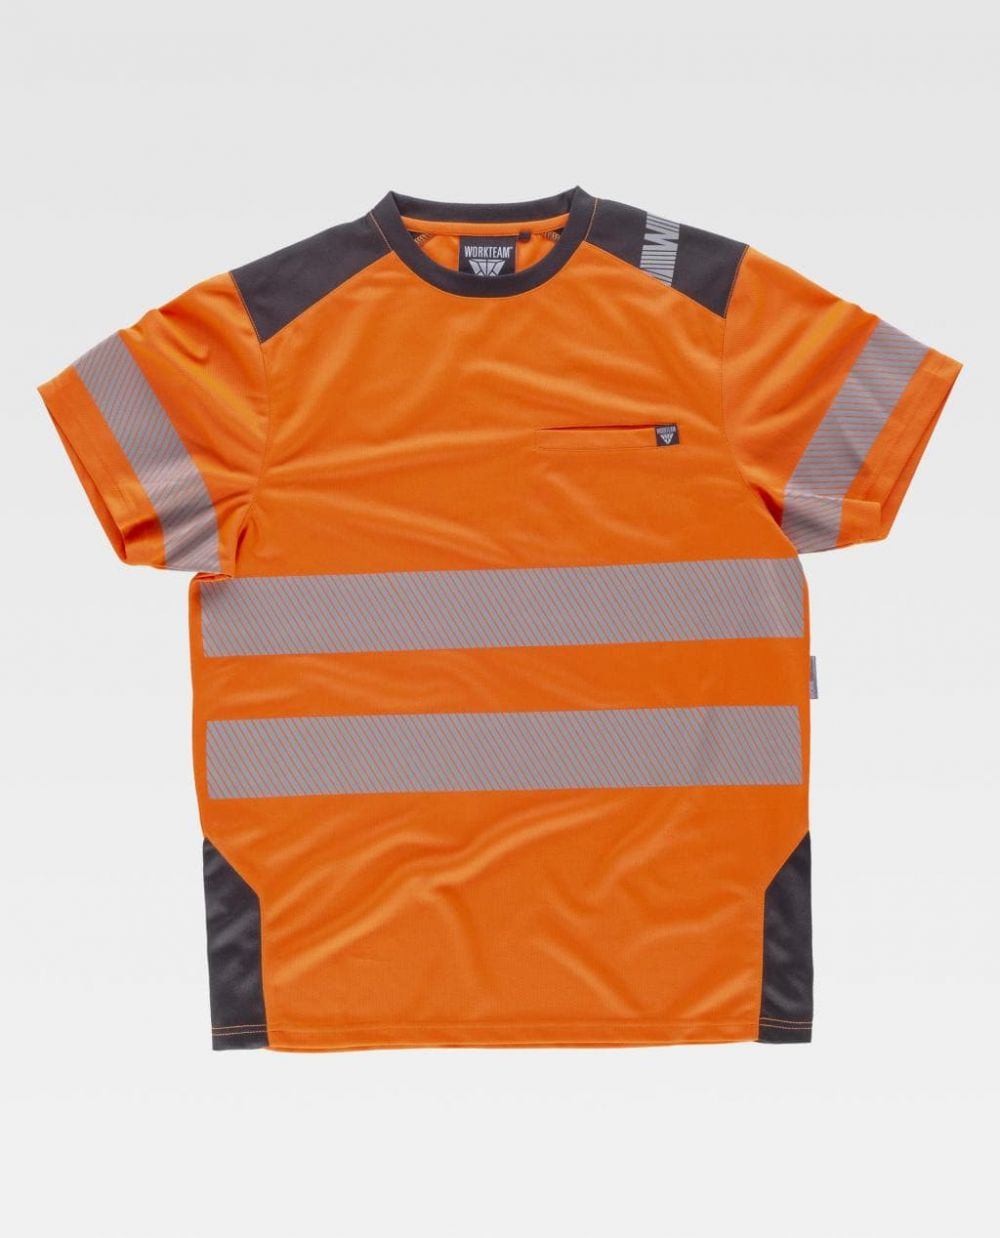 Camisetas reflectantes workteam mc alta visibilidad combinada de poliéster vista 1